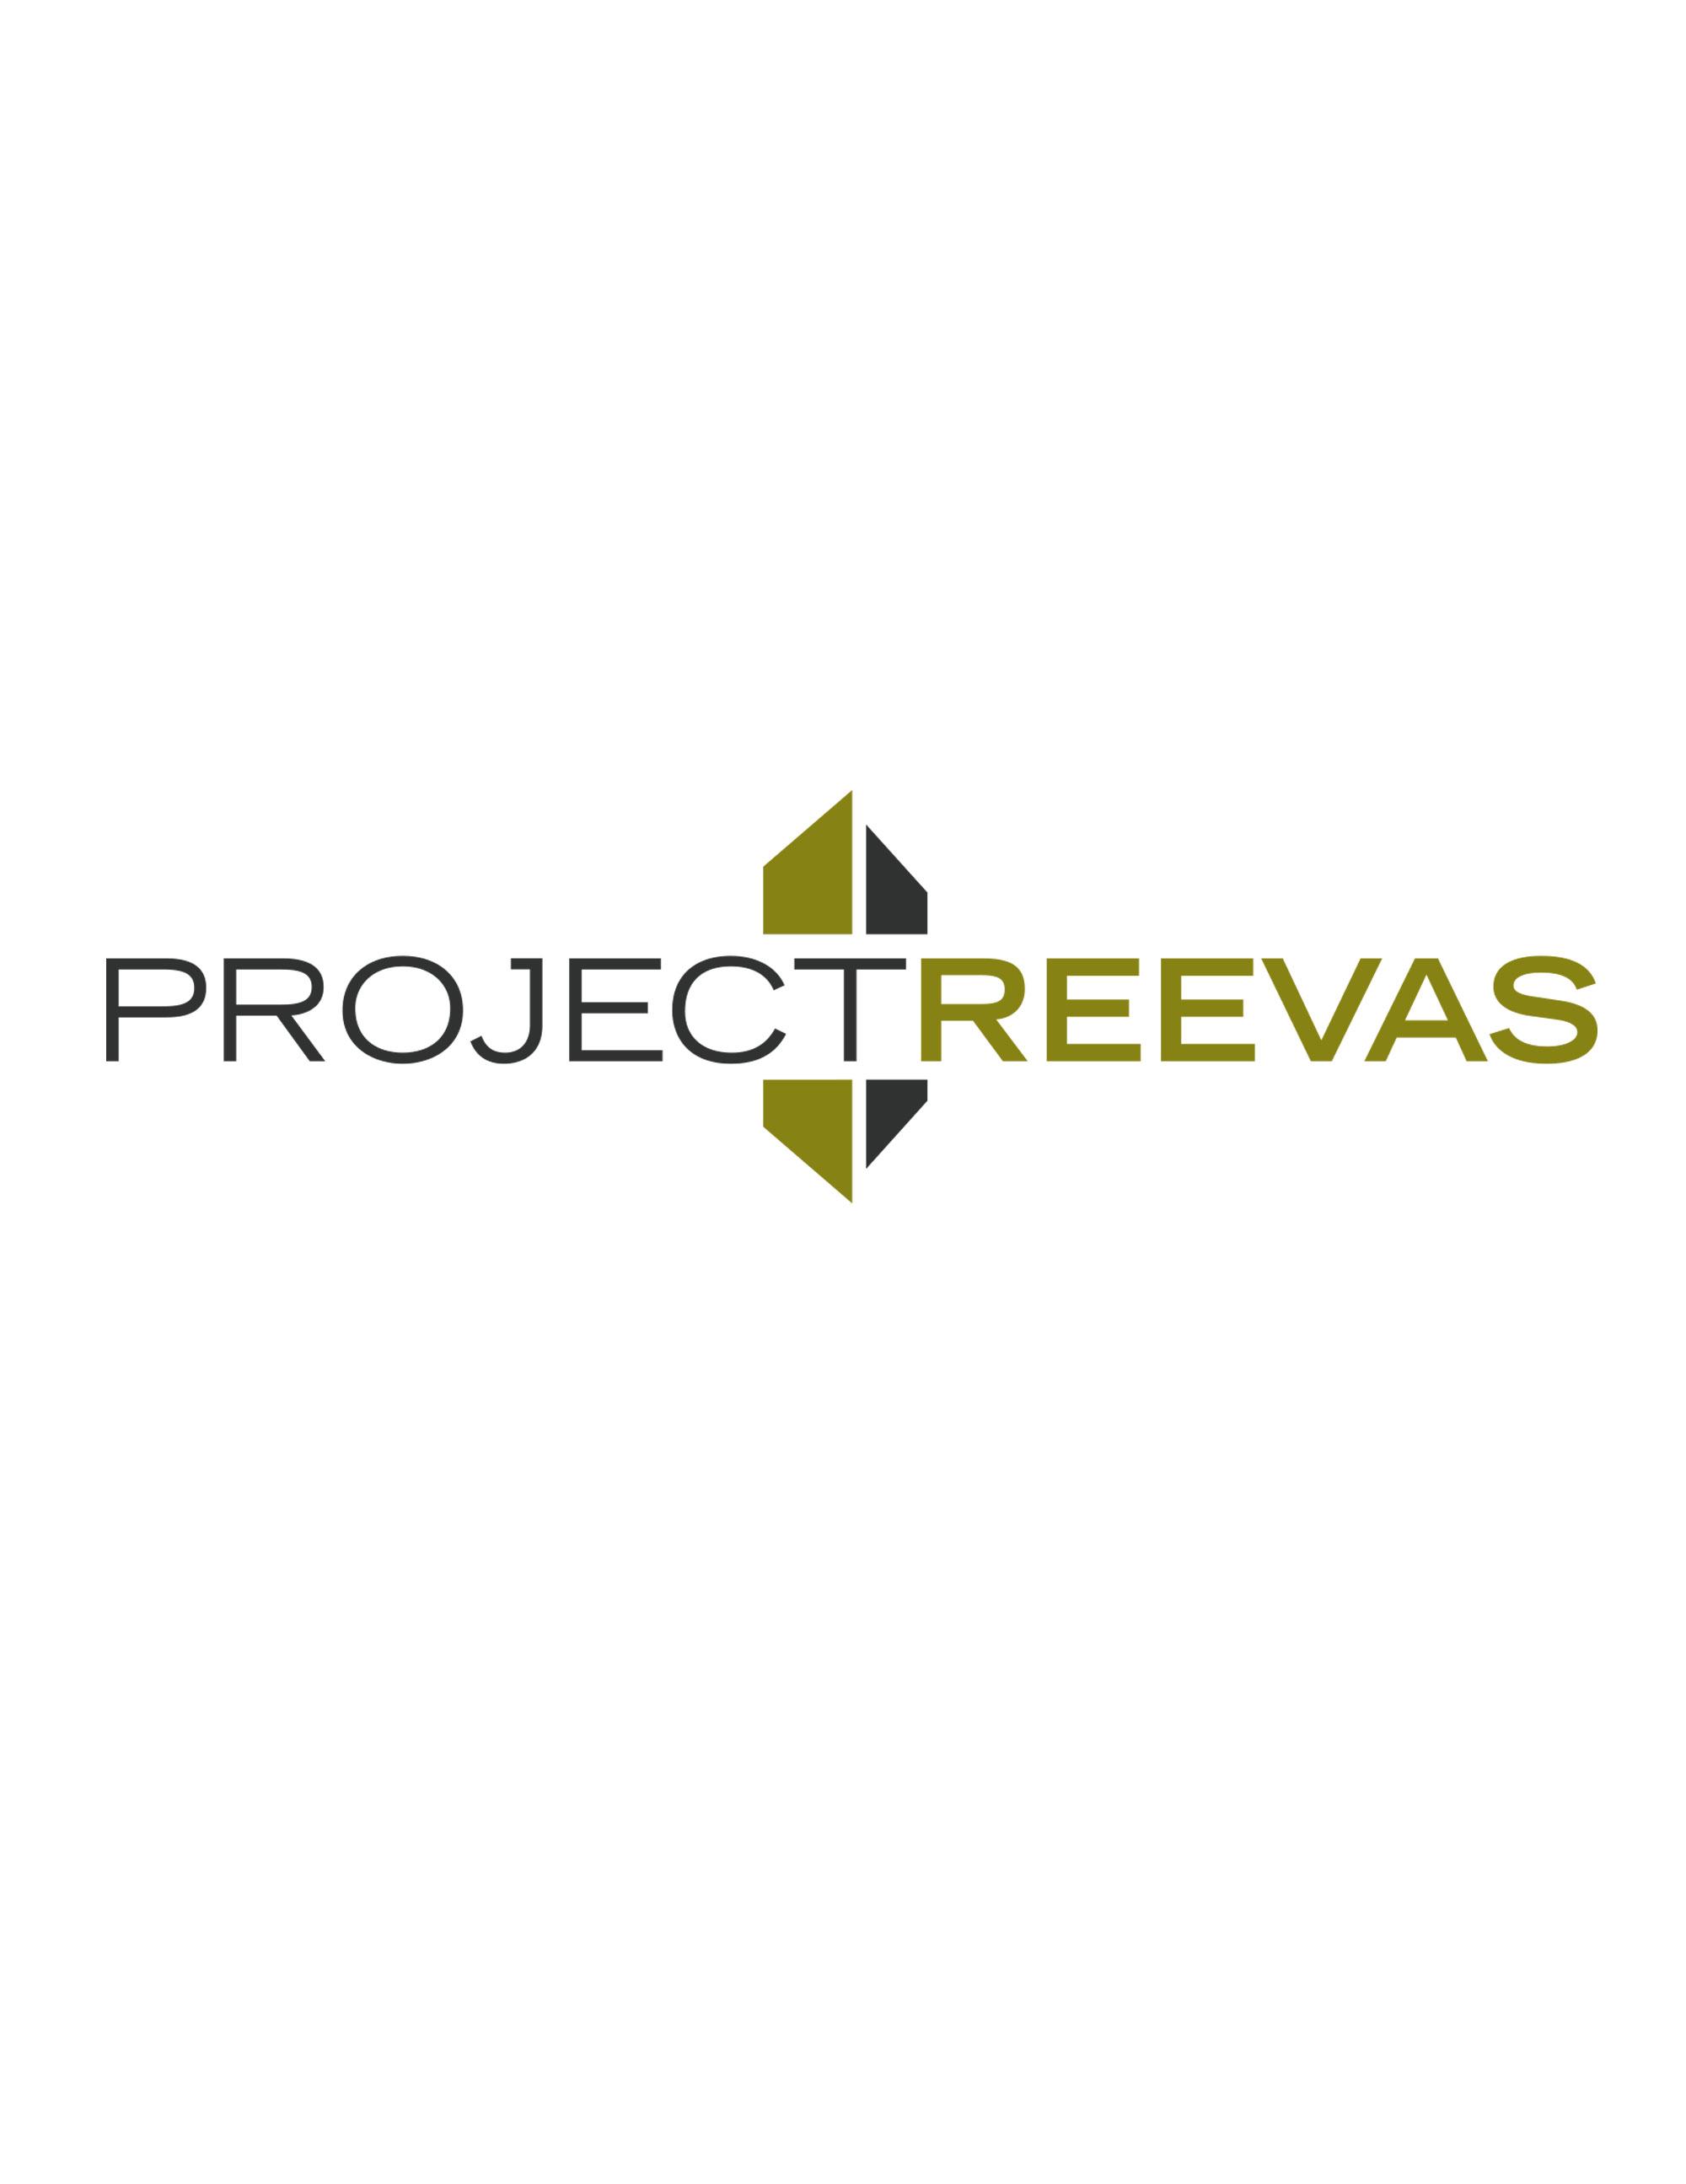 reevas_left